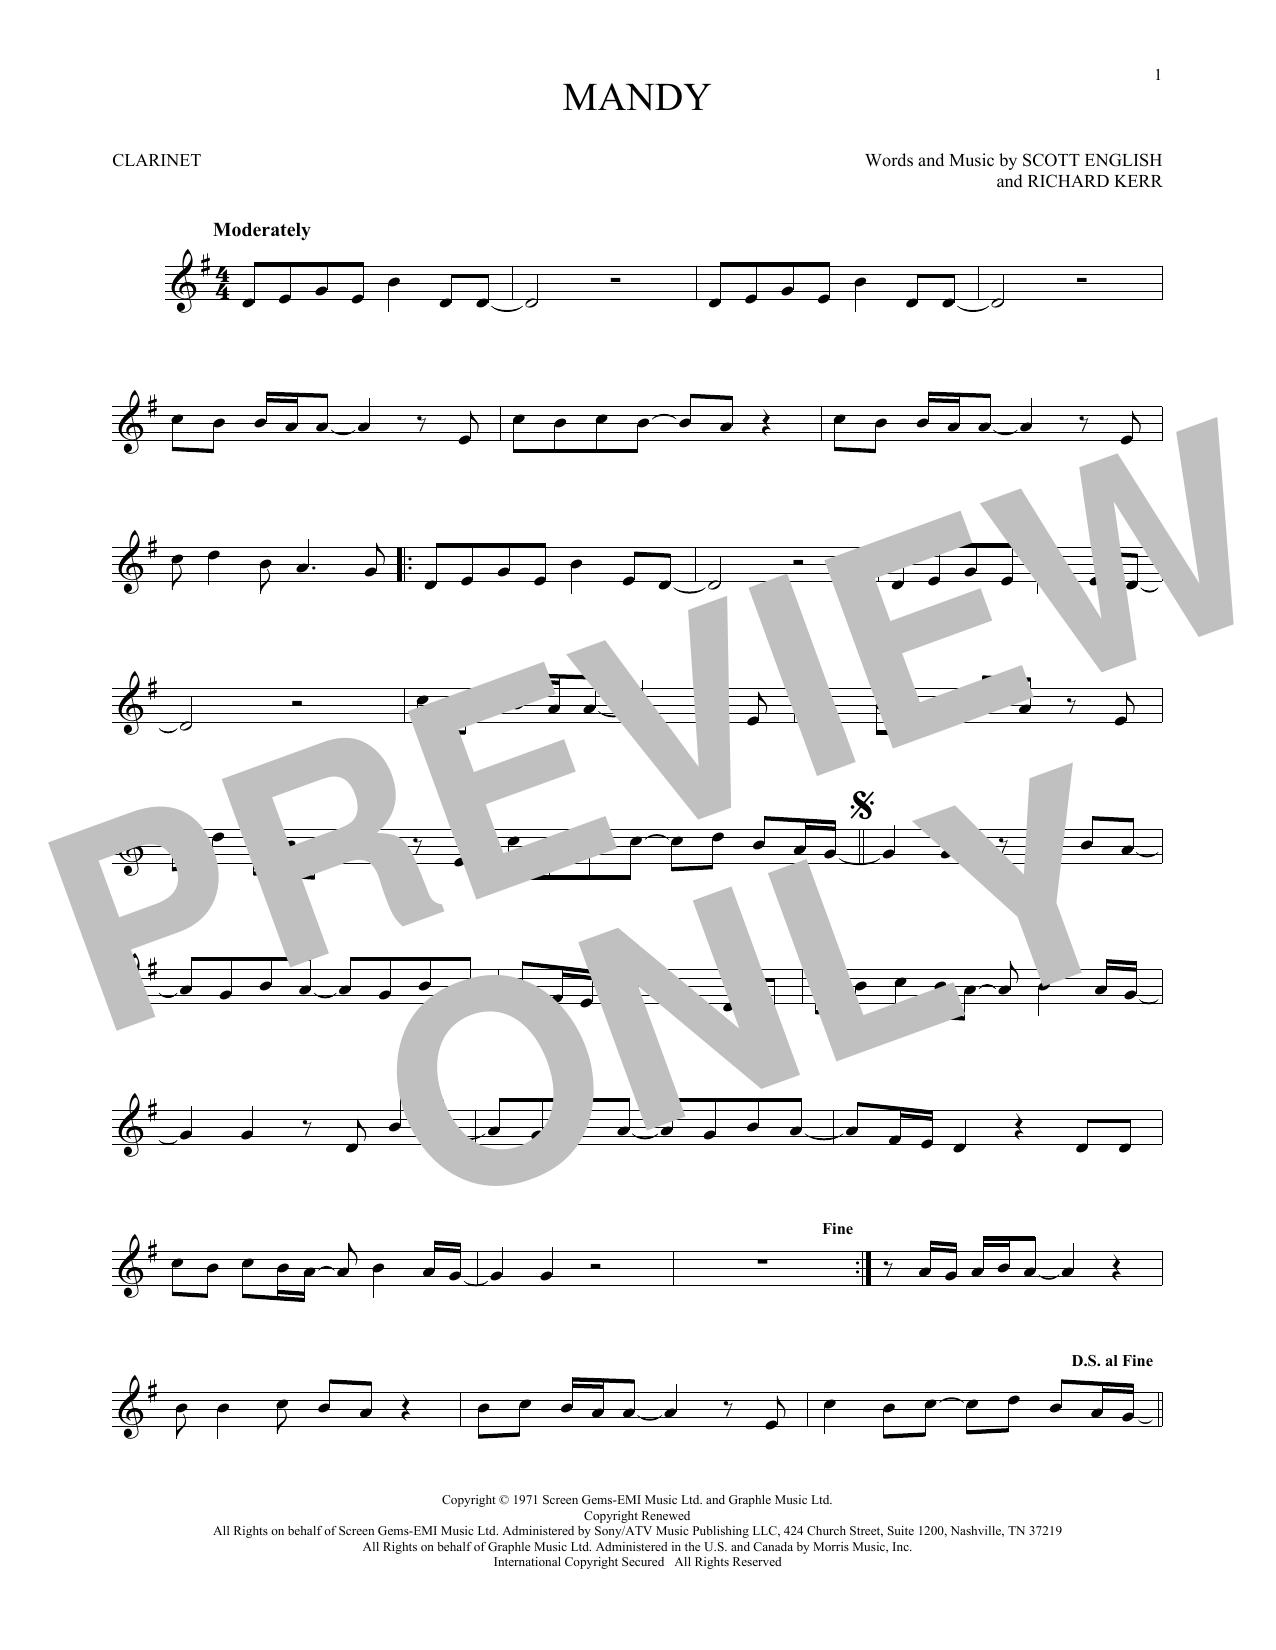 Mandy (Clarinet Solo)